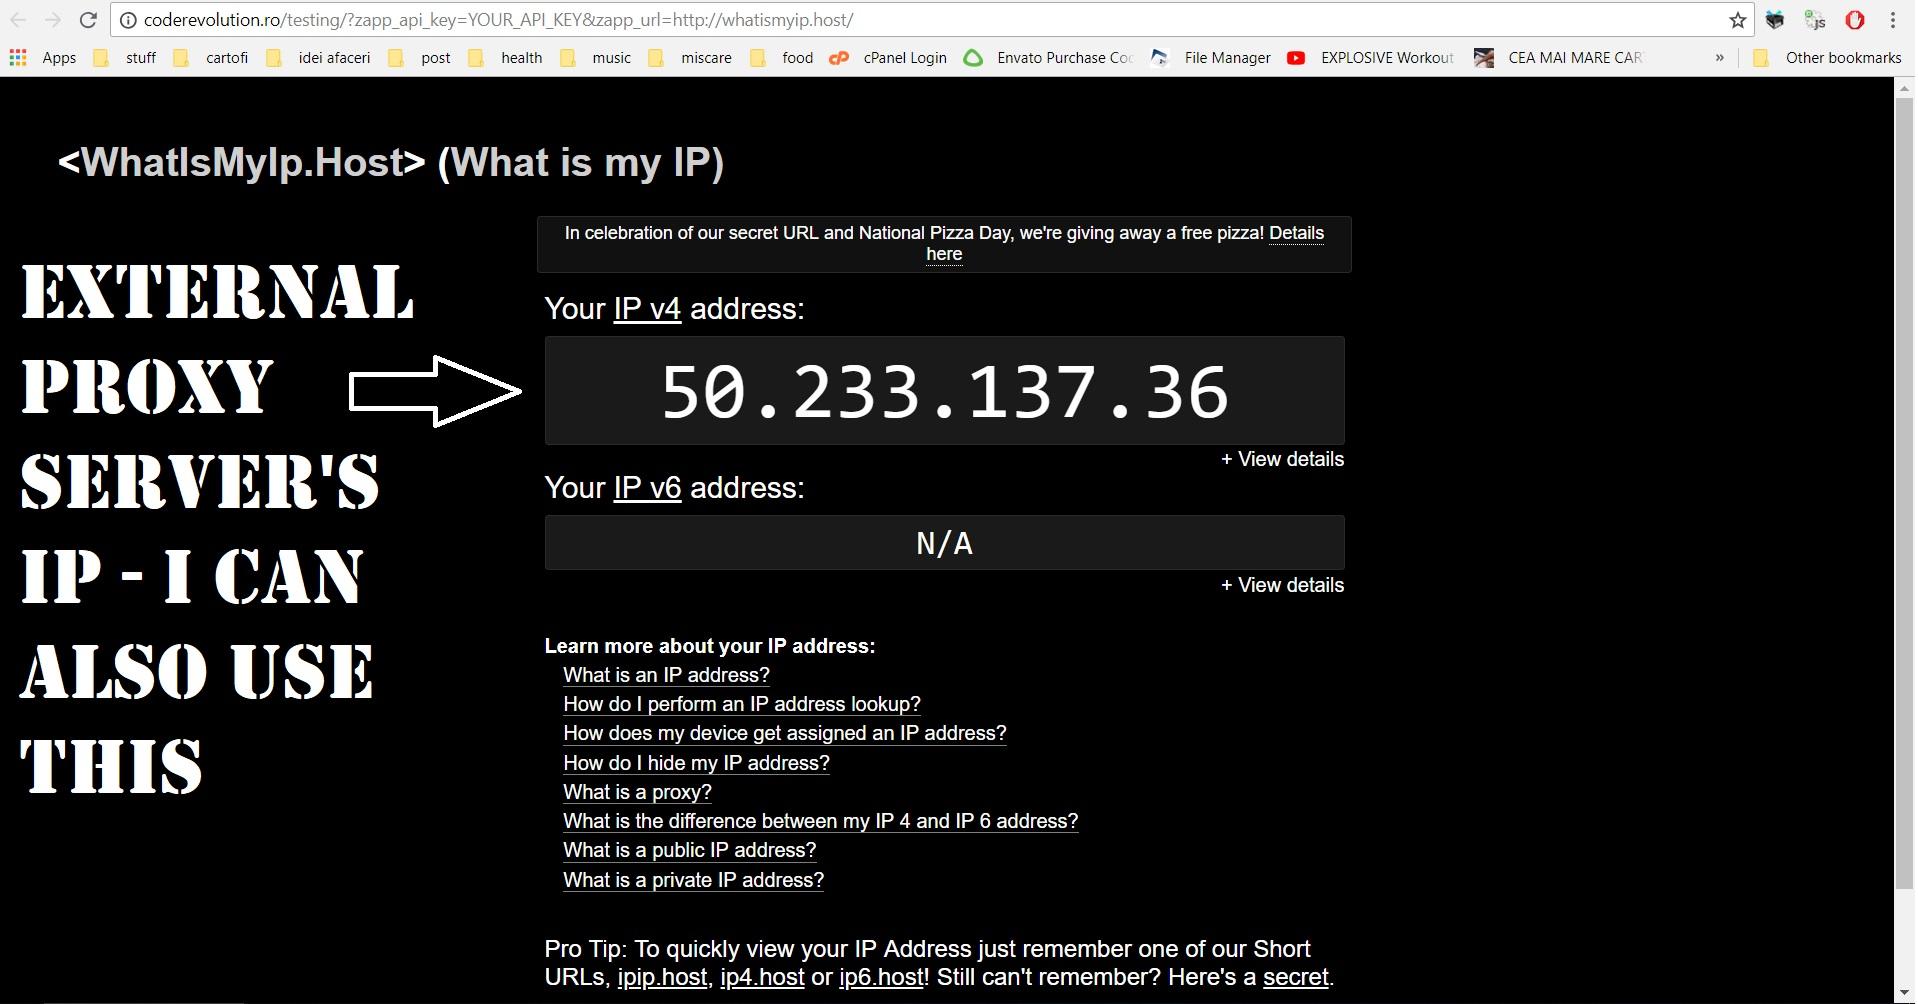 Zapp Proxy Server Plugin for WordPress